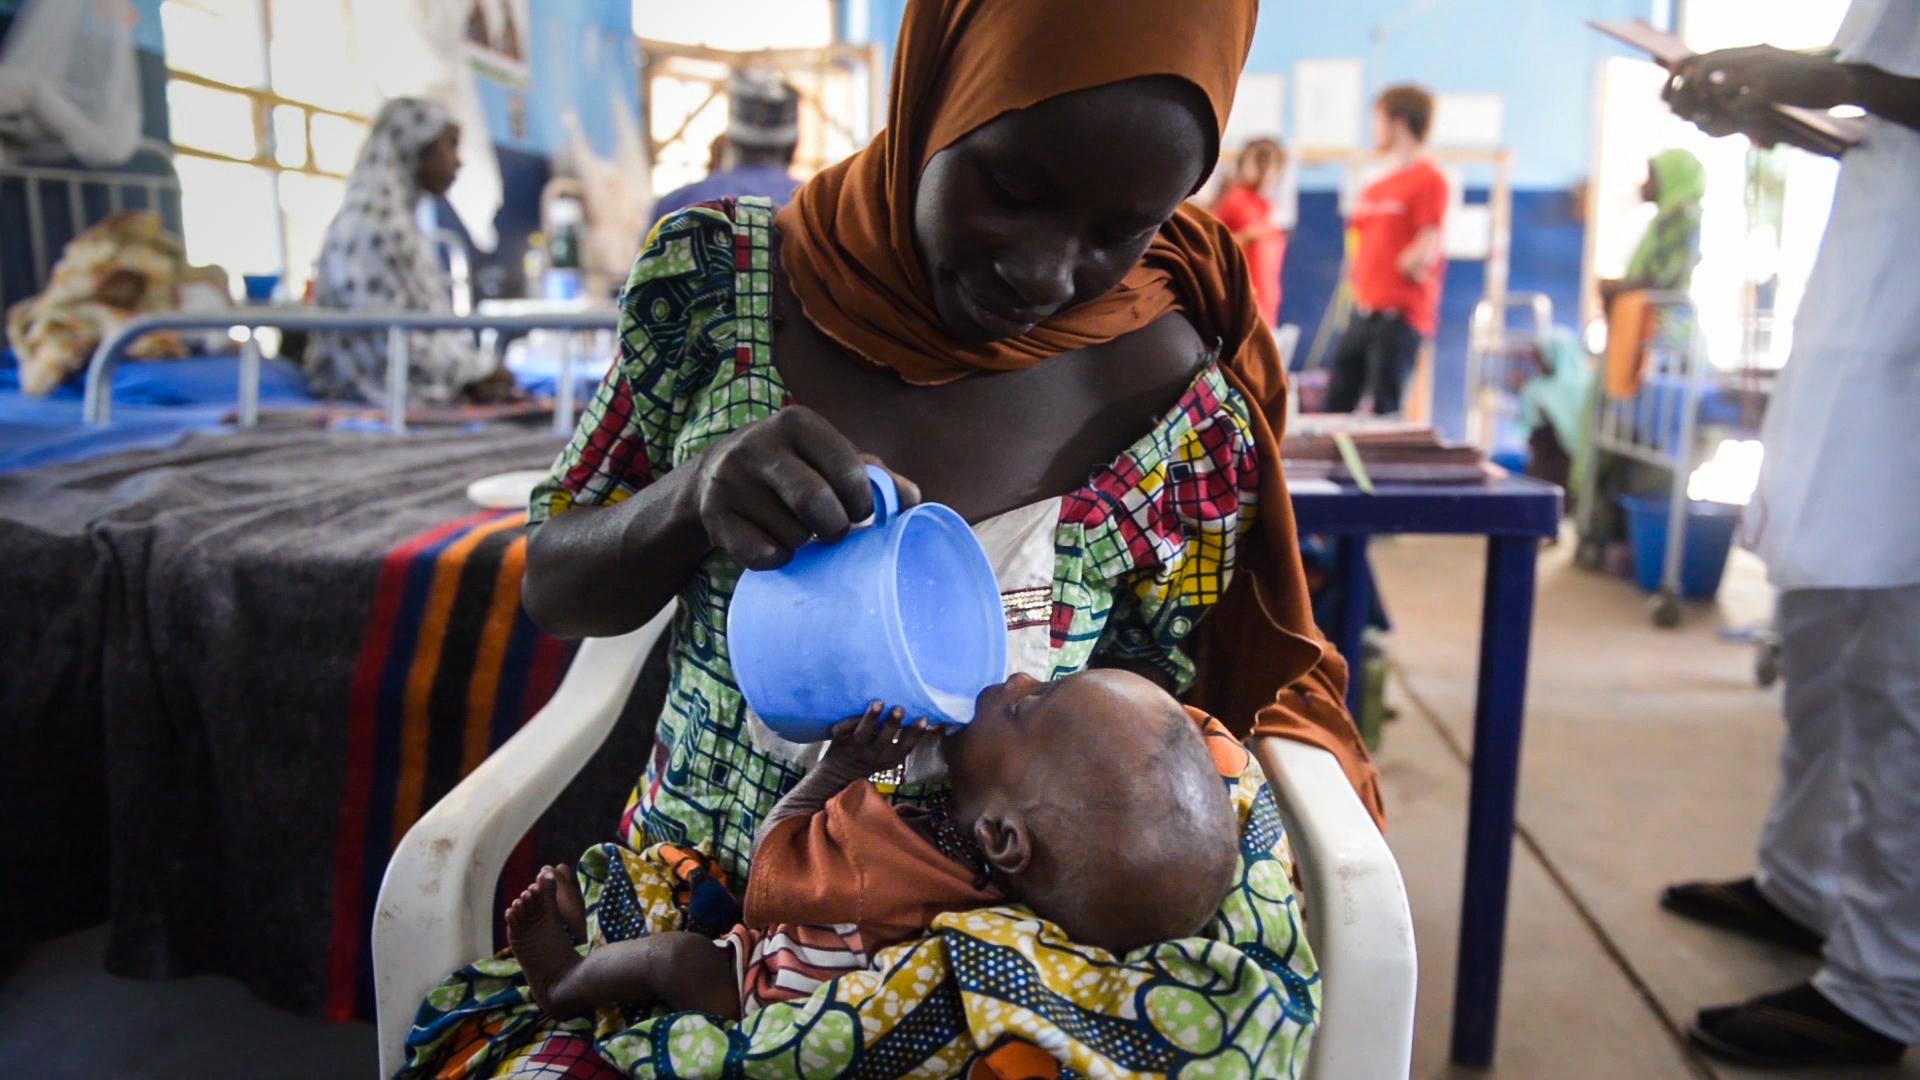 Emergencia hambre en África | Save the Children